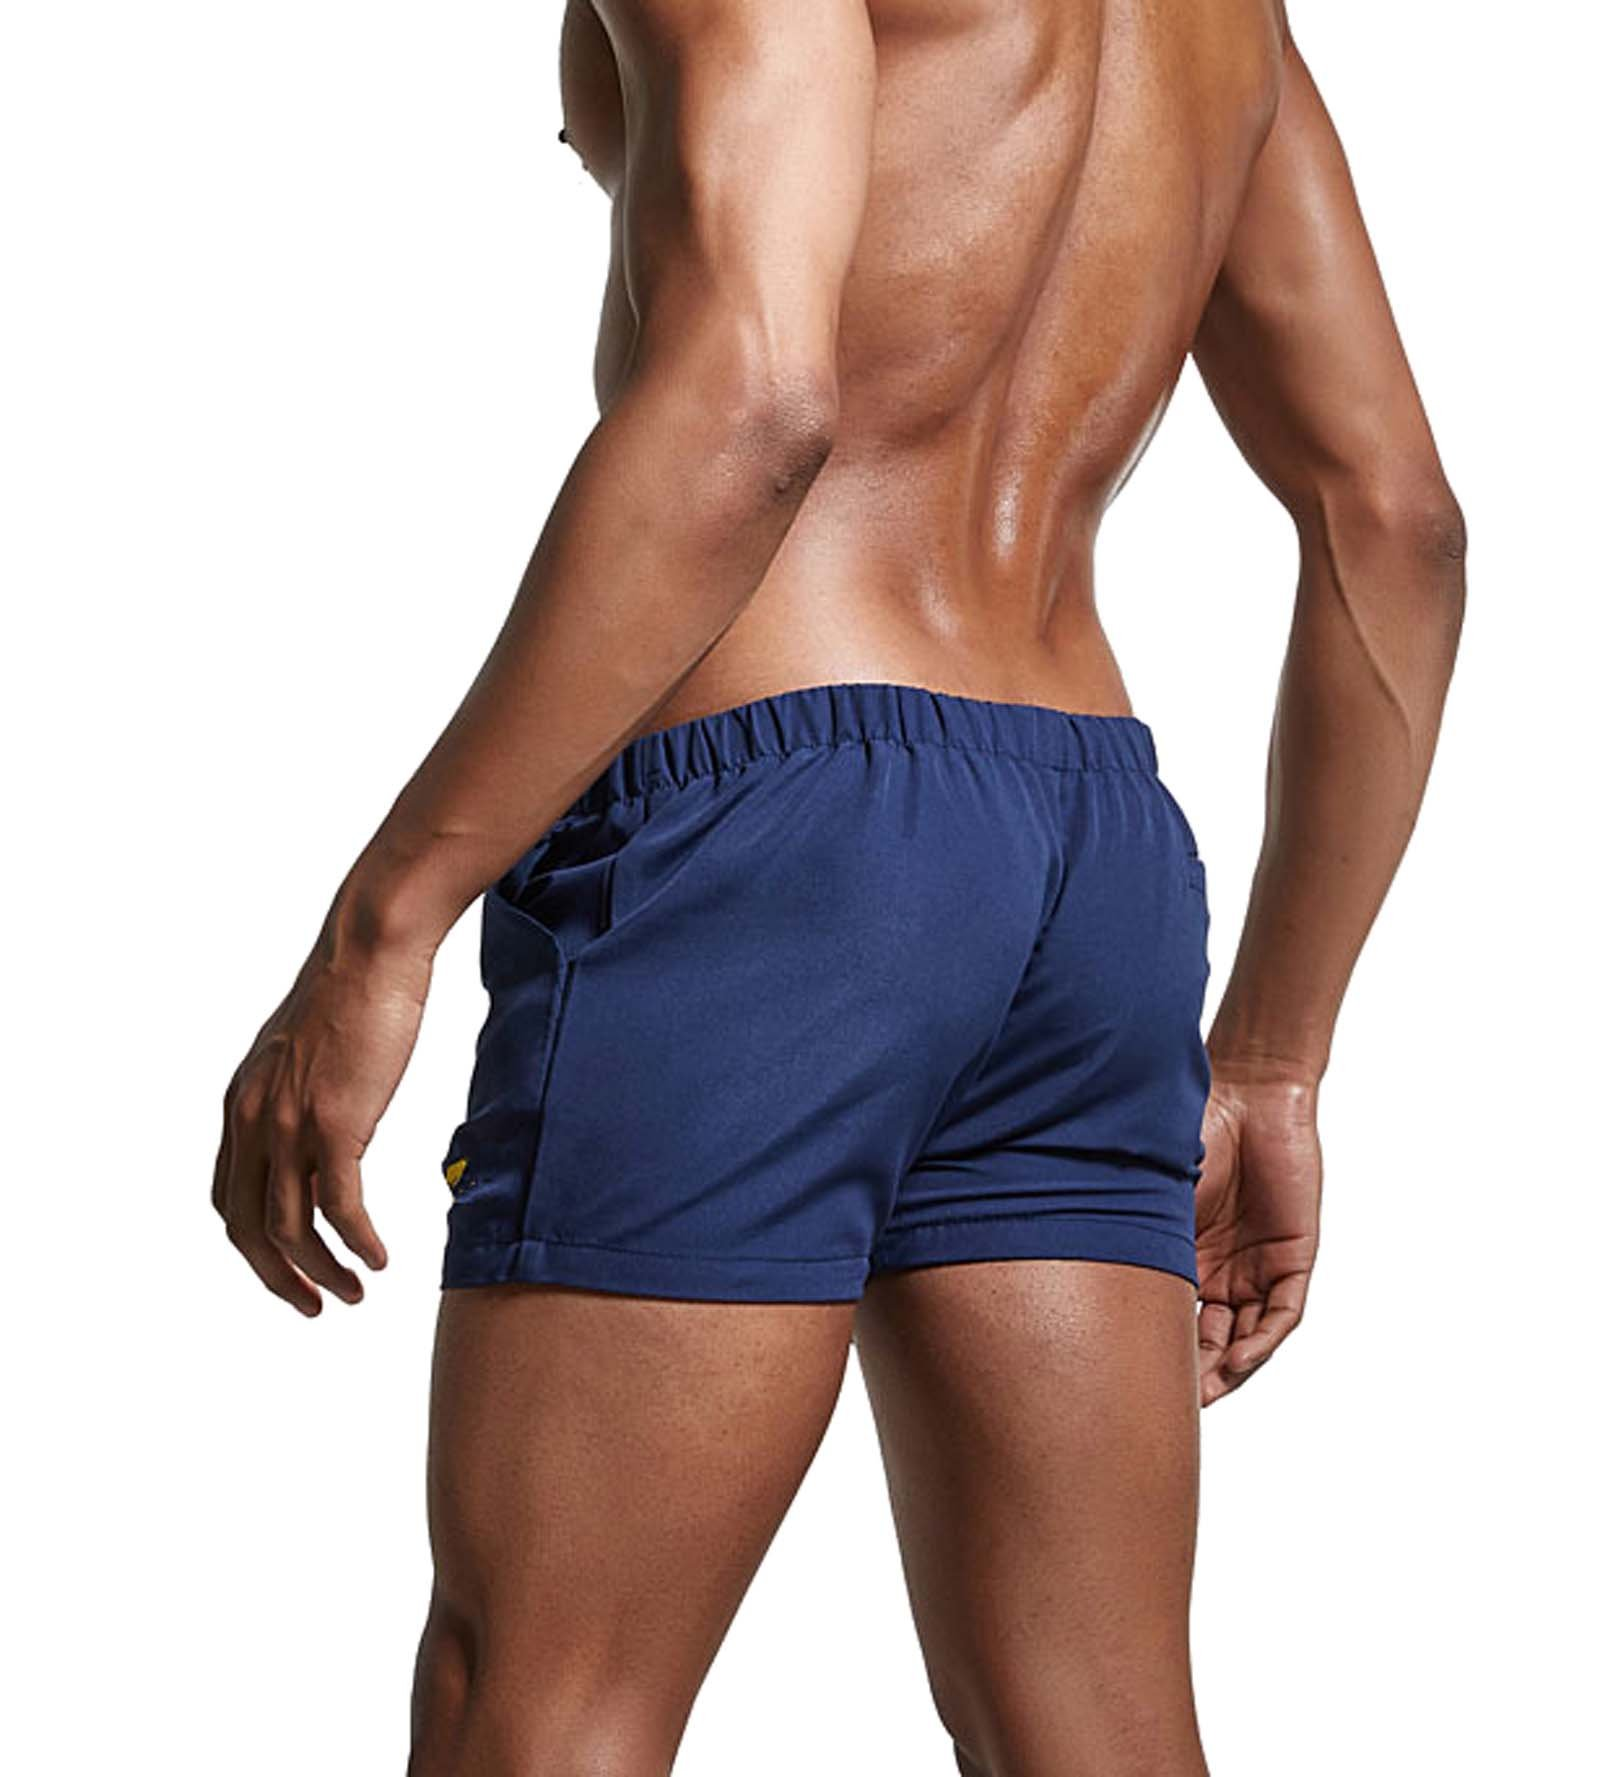 Mens Swimming Trunk Swim Briefs Boxer Short Bikini Swimwear Swimsuit for Men by Roti Garden (Image #6)